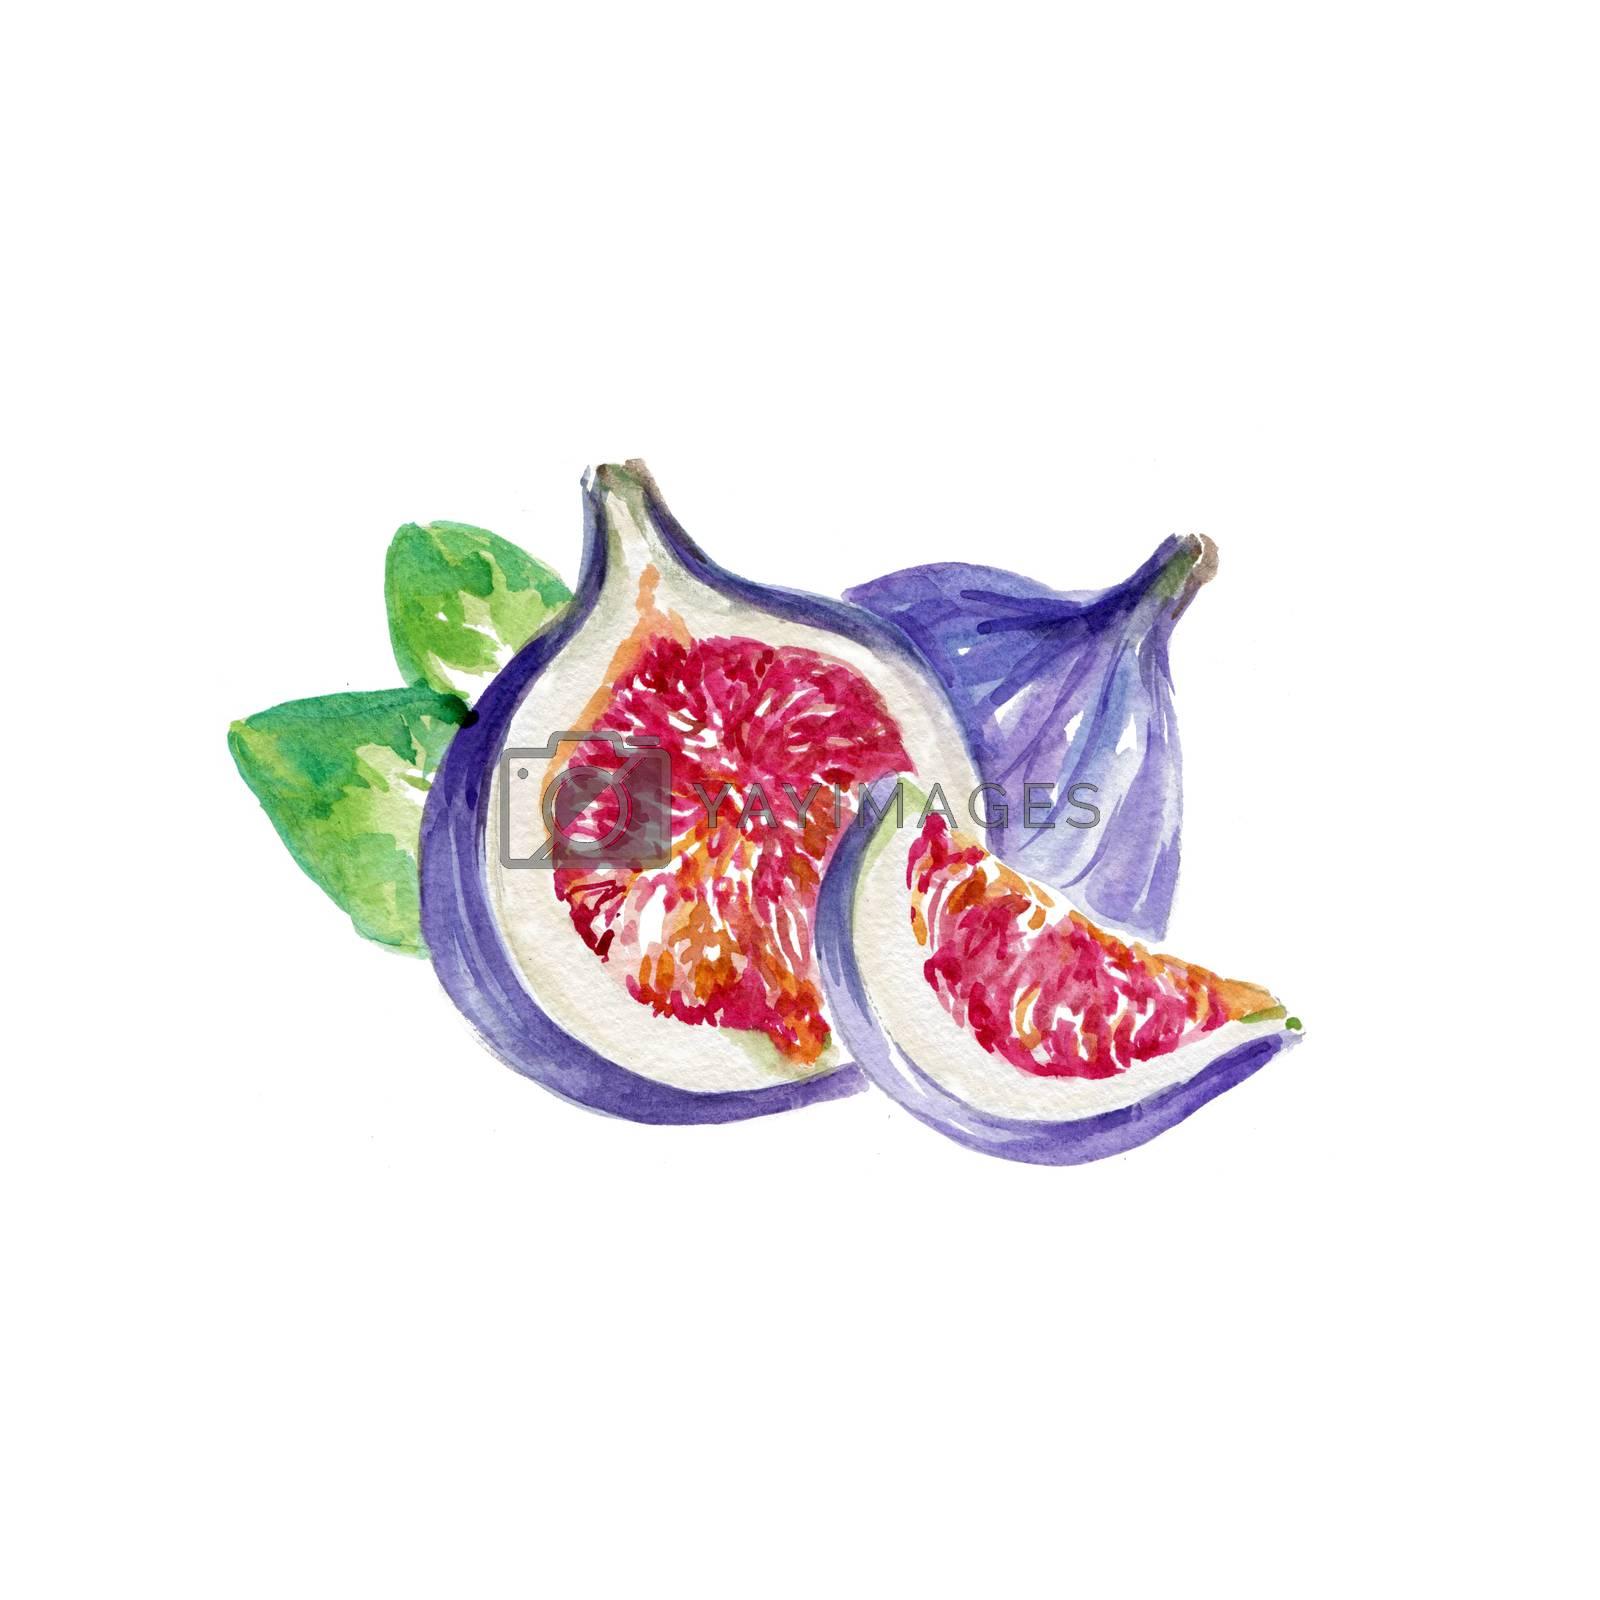 Watercolor Whole Figs. Hand Drawn Illustration Organic Food Vegetarian Ingredient